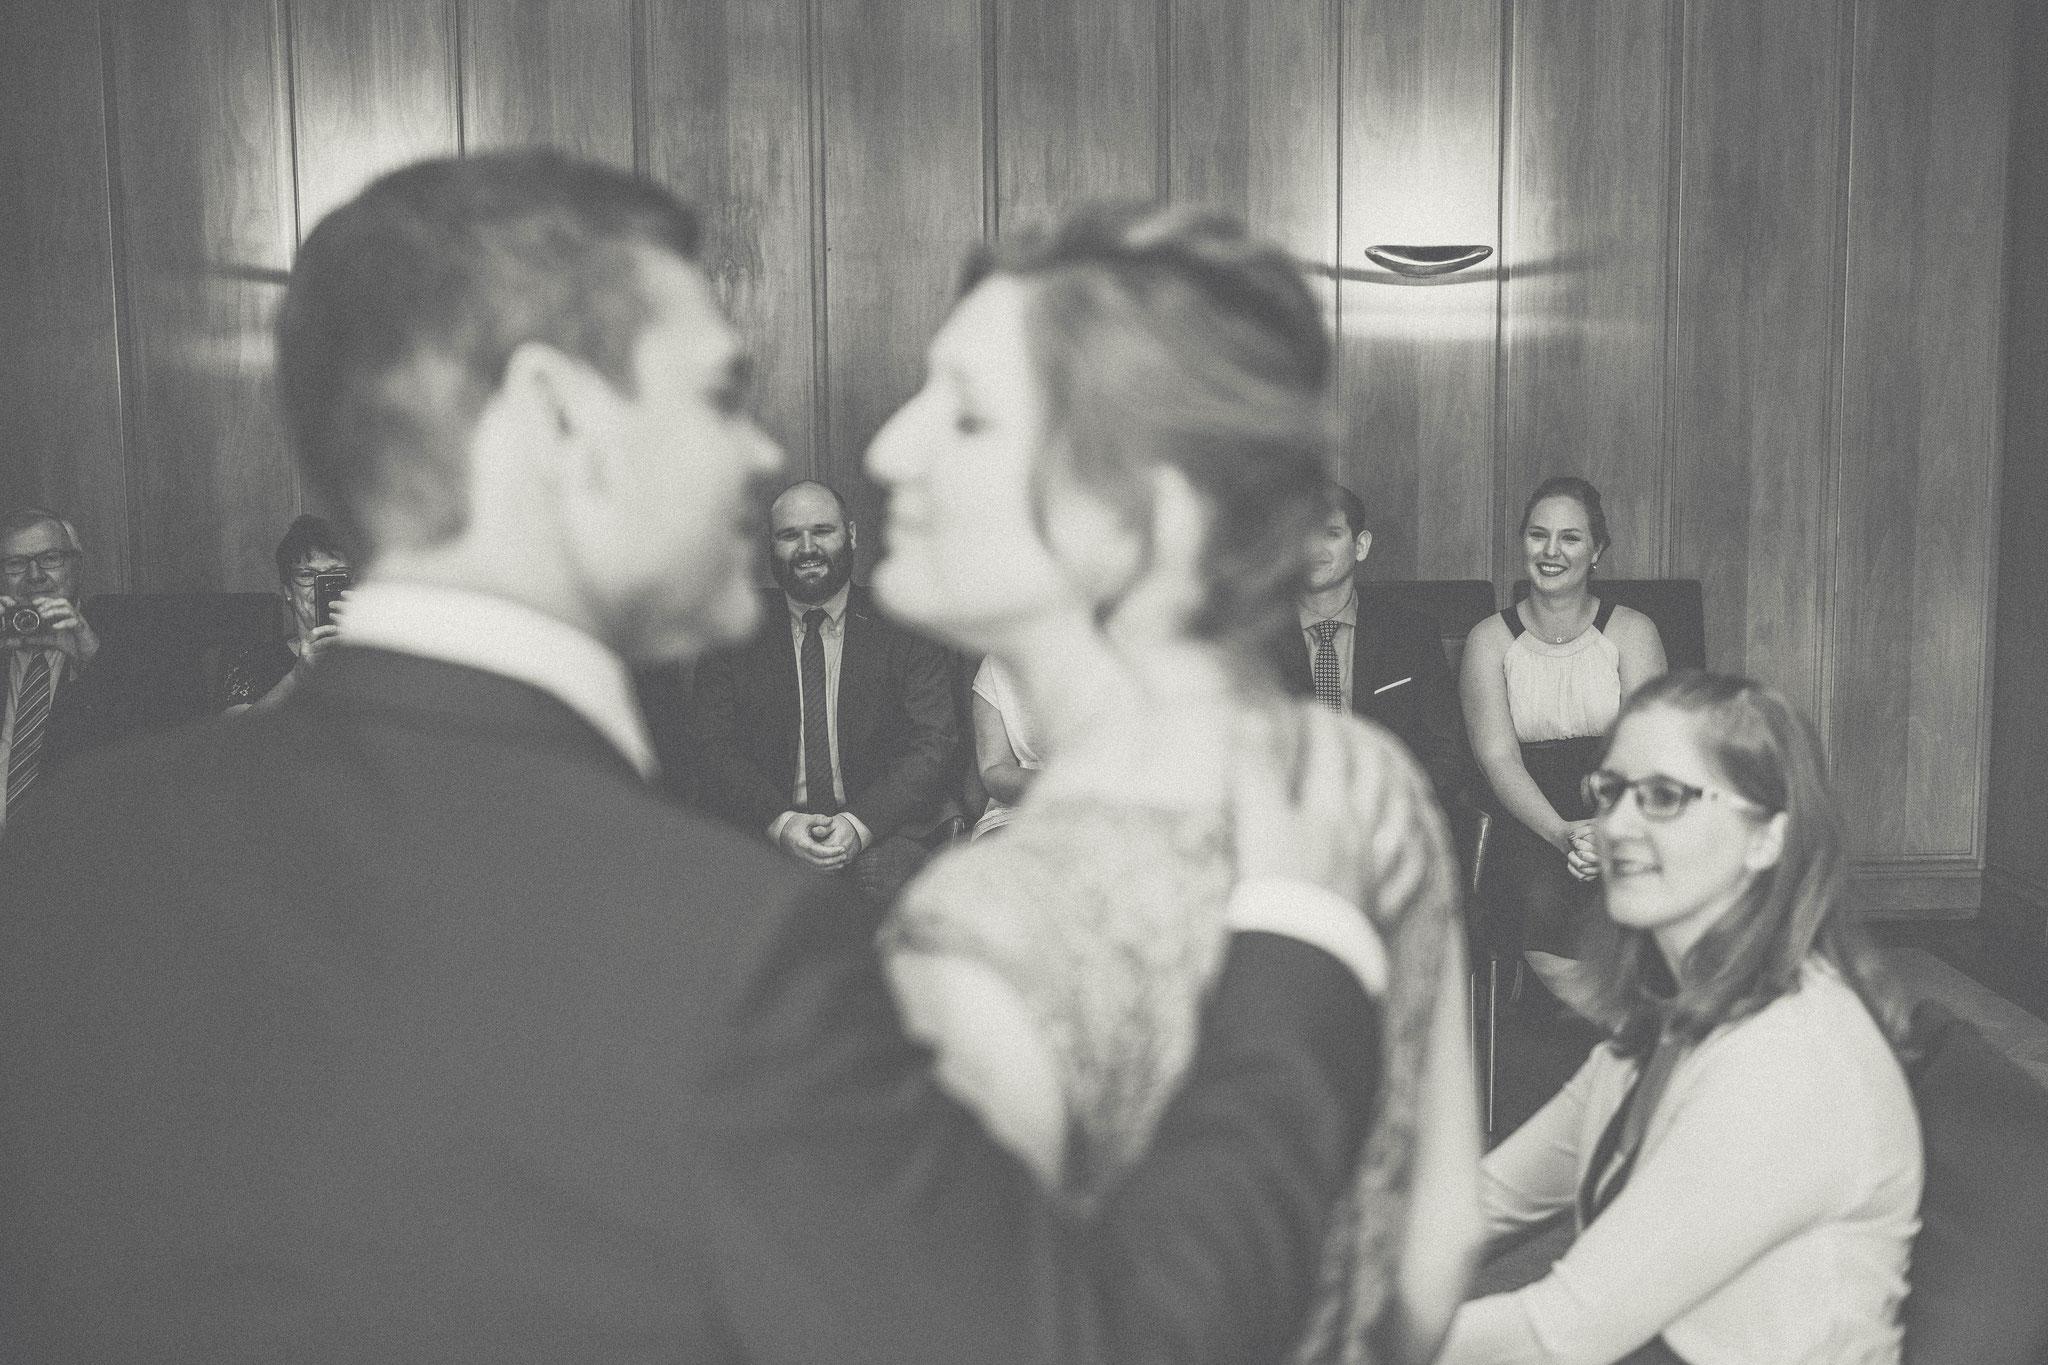 Bräutigam schaut liebevoll seine Braut an